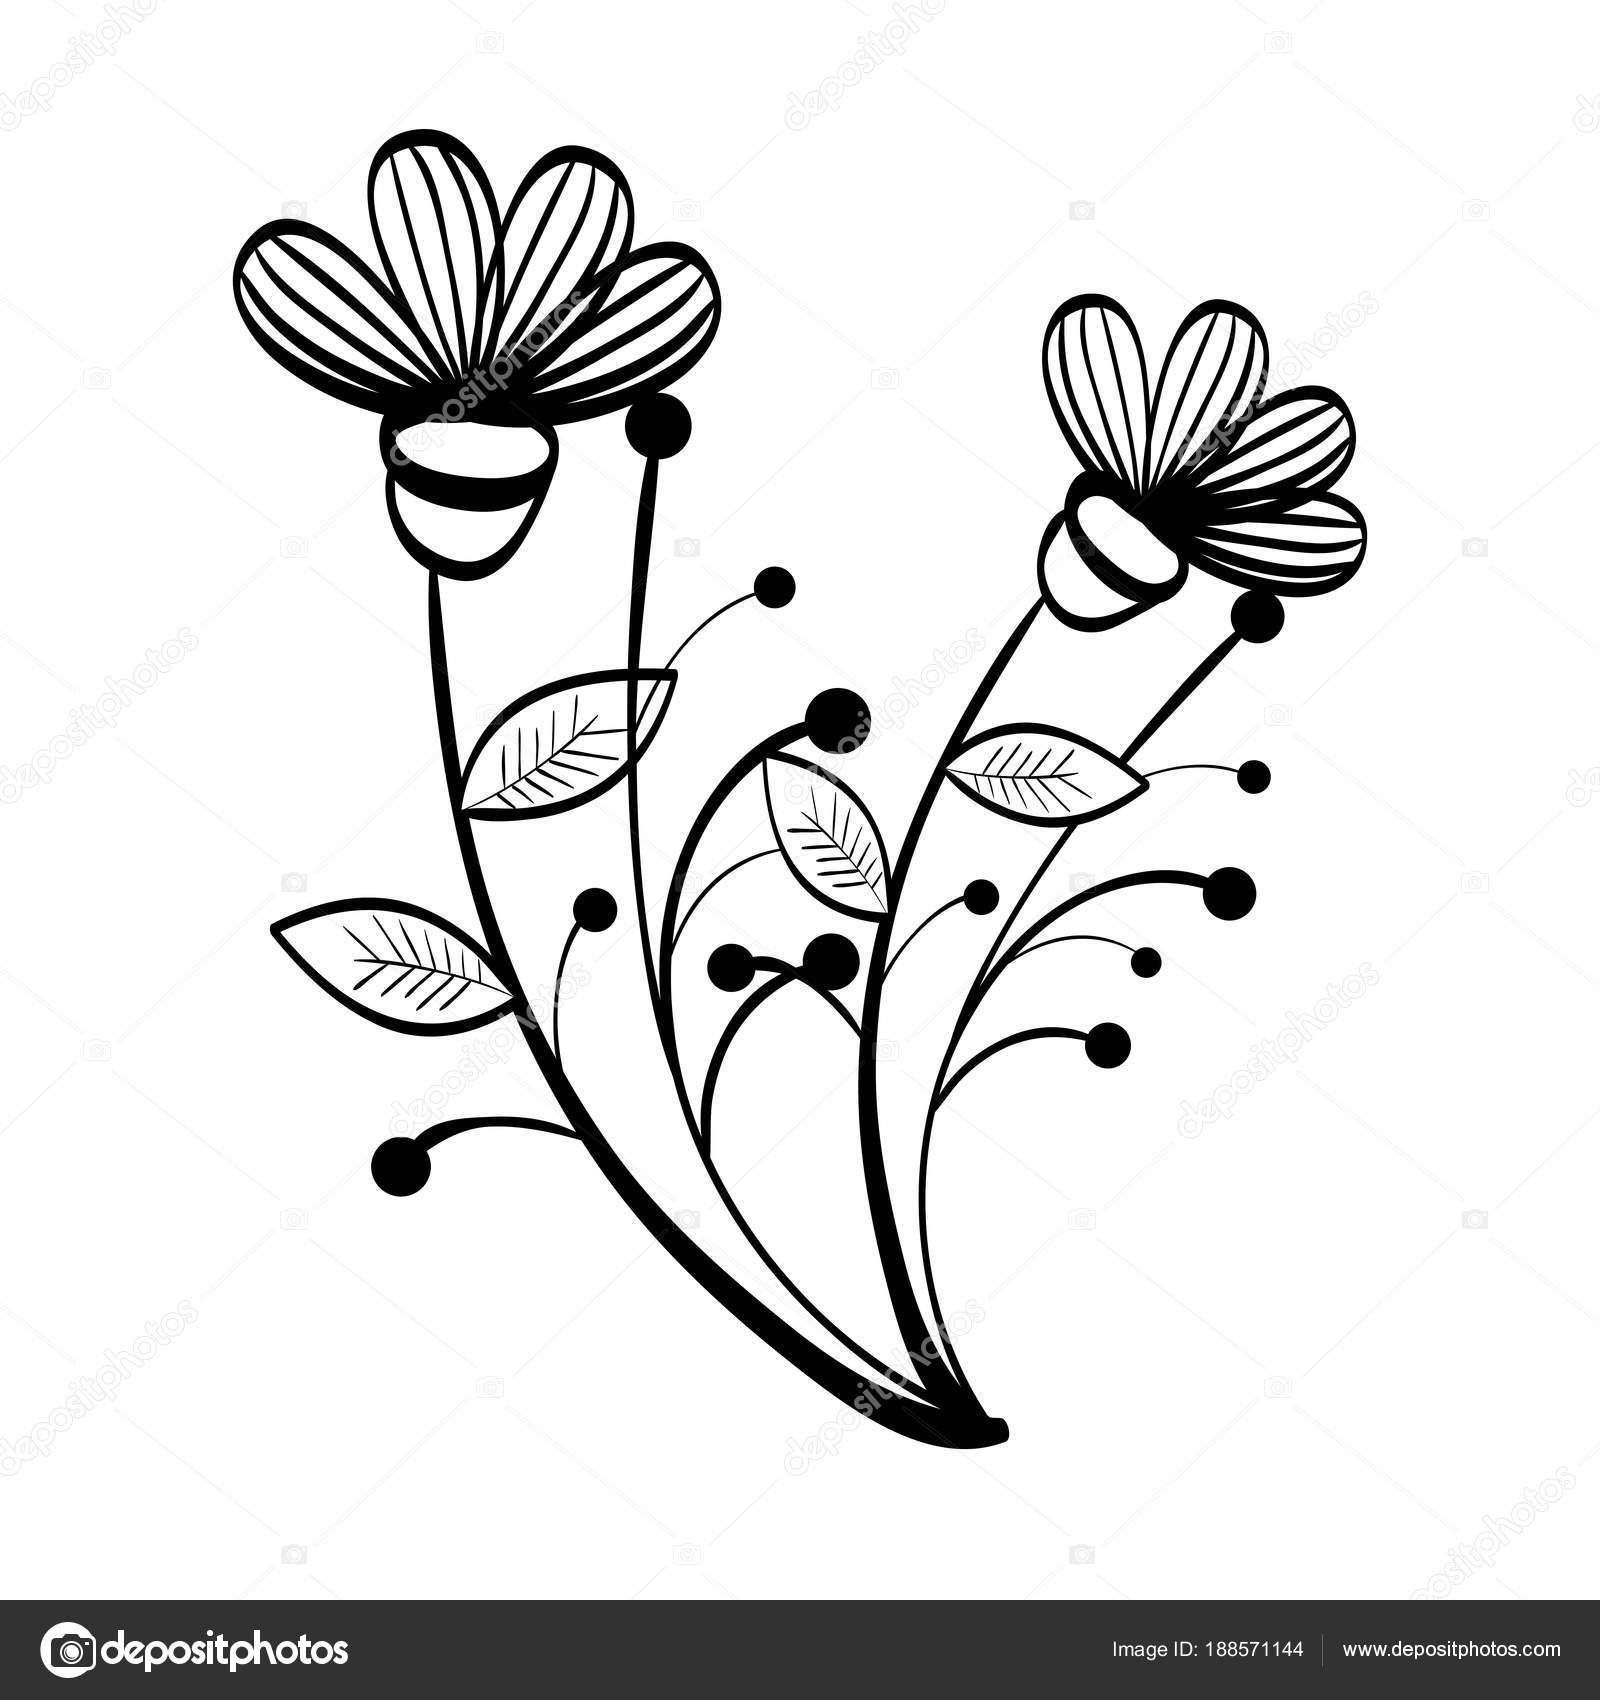 Rucne Kreslene Kvetiny Design Stock Vektor C Yupiramos 188571144